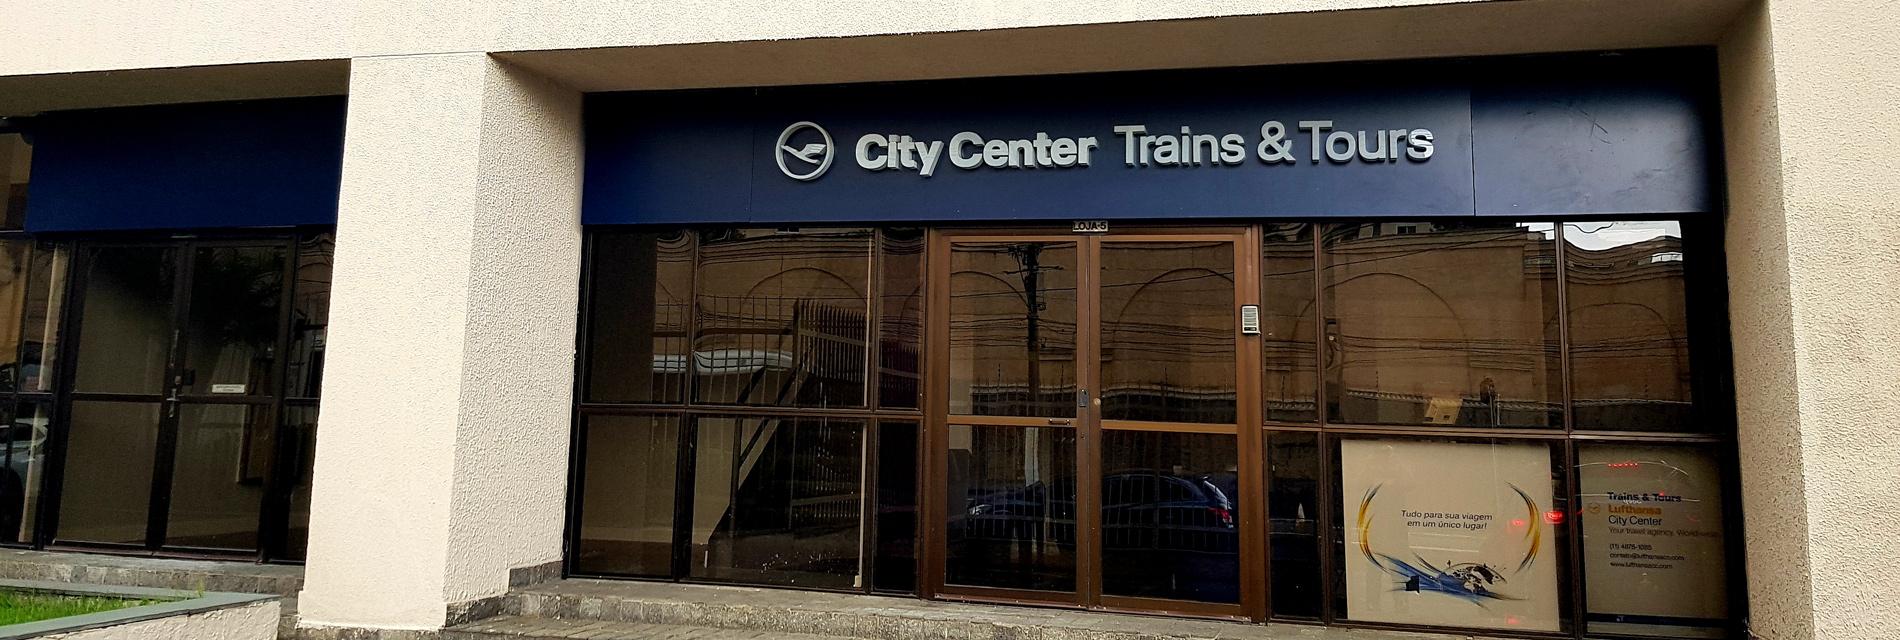 Lufthansa City Center Trains and Tours Sao Paulo